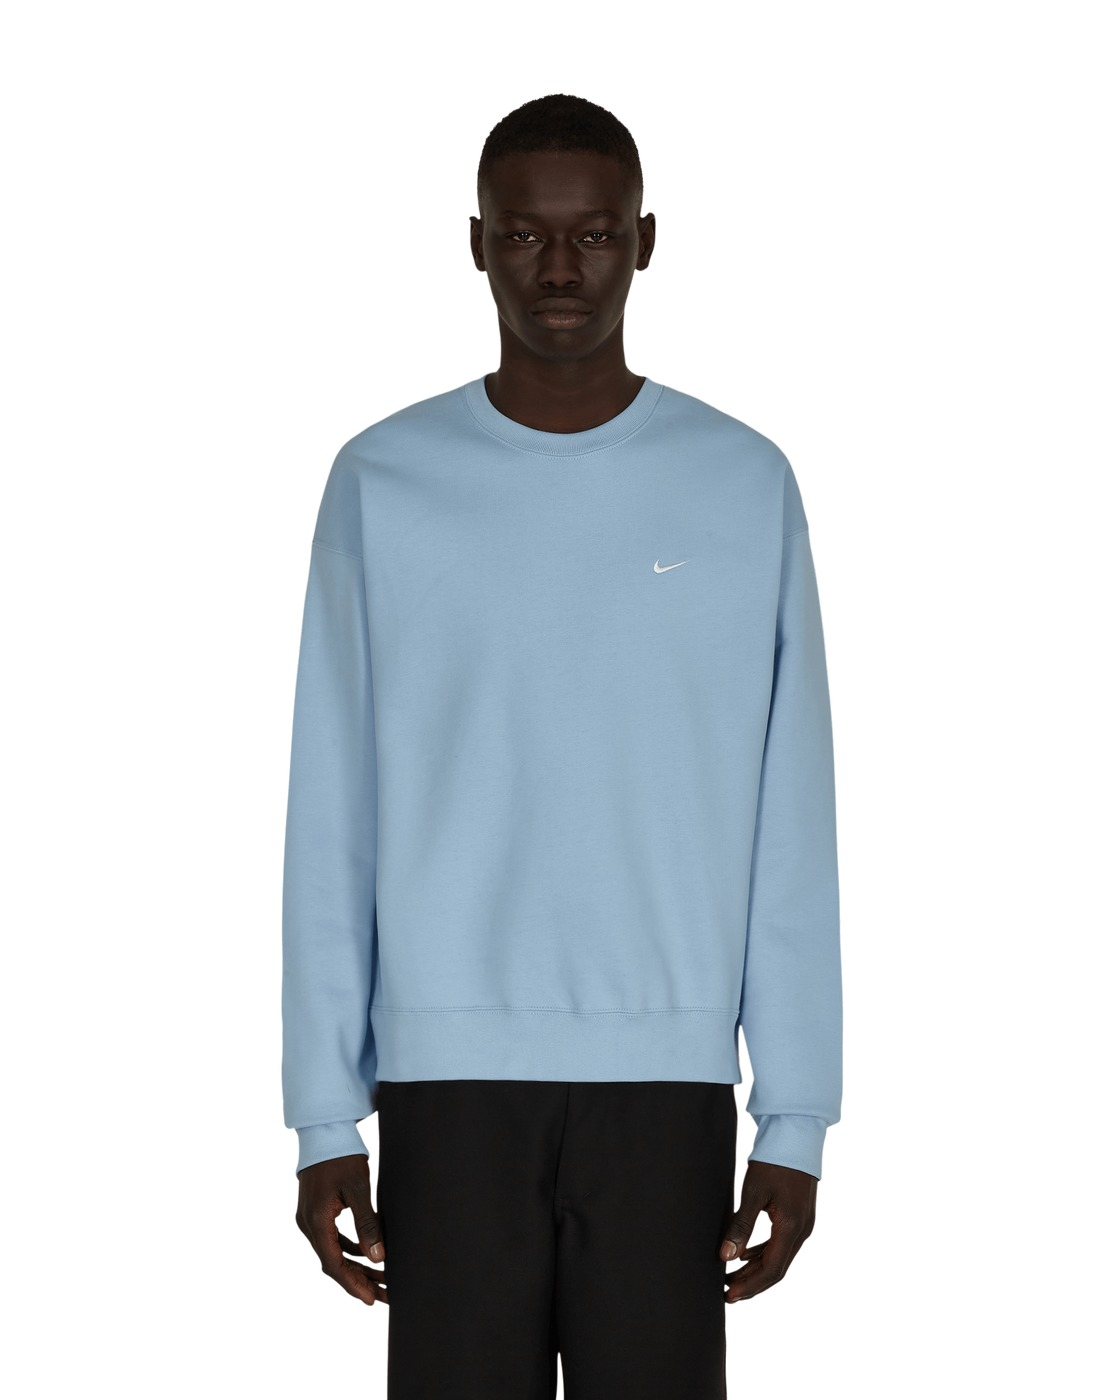 Photo: Nike Special Project Solo Swoosh Crewneck Sweatshirt Psychic Blue/White